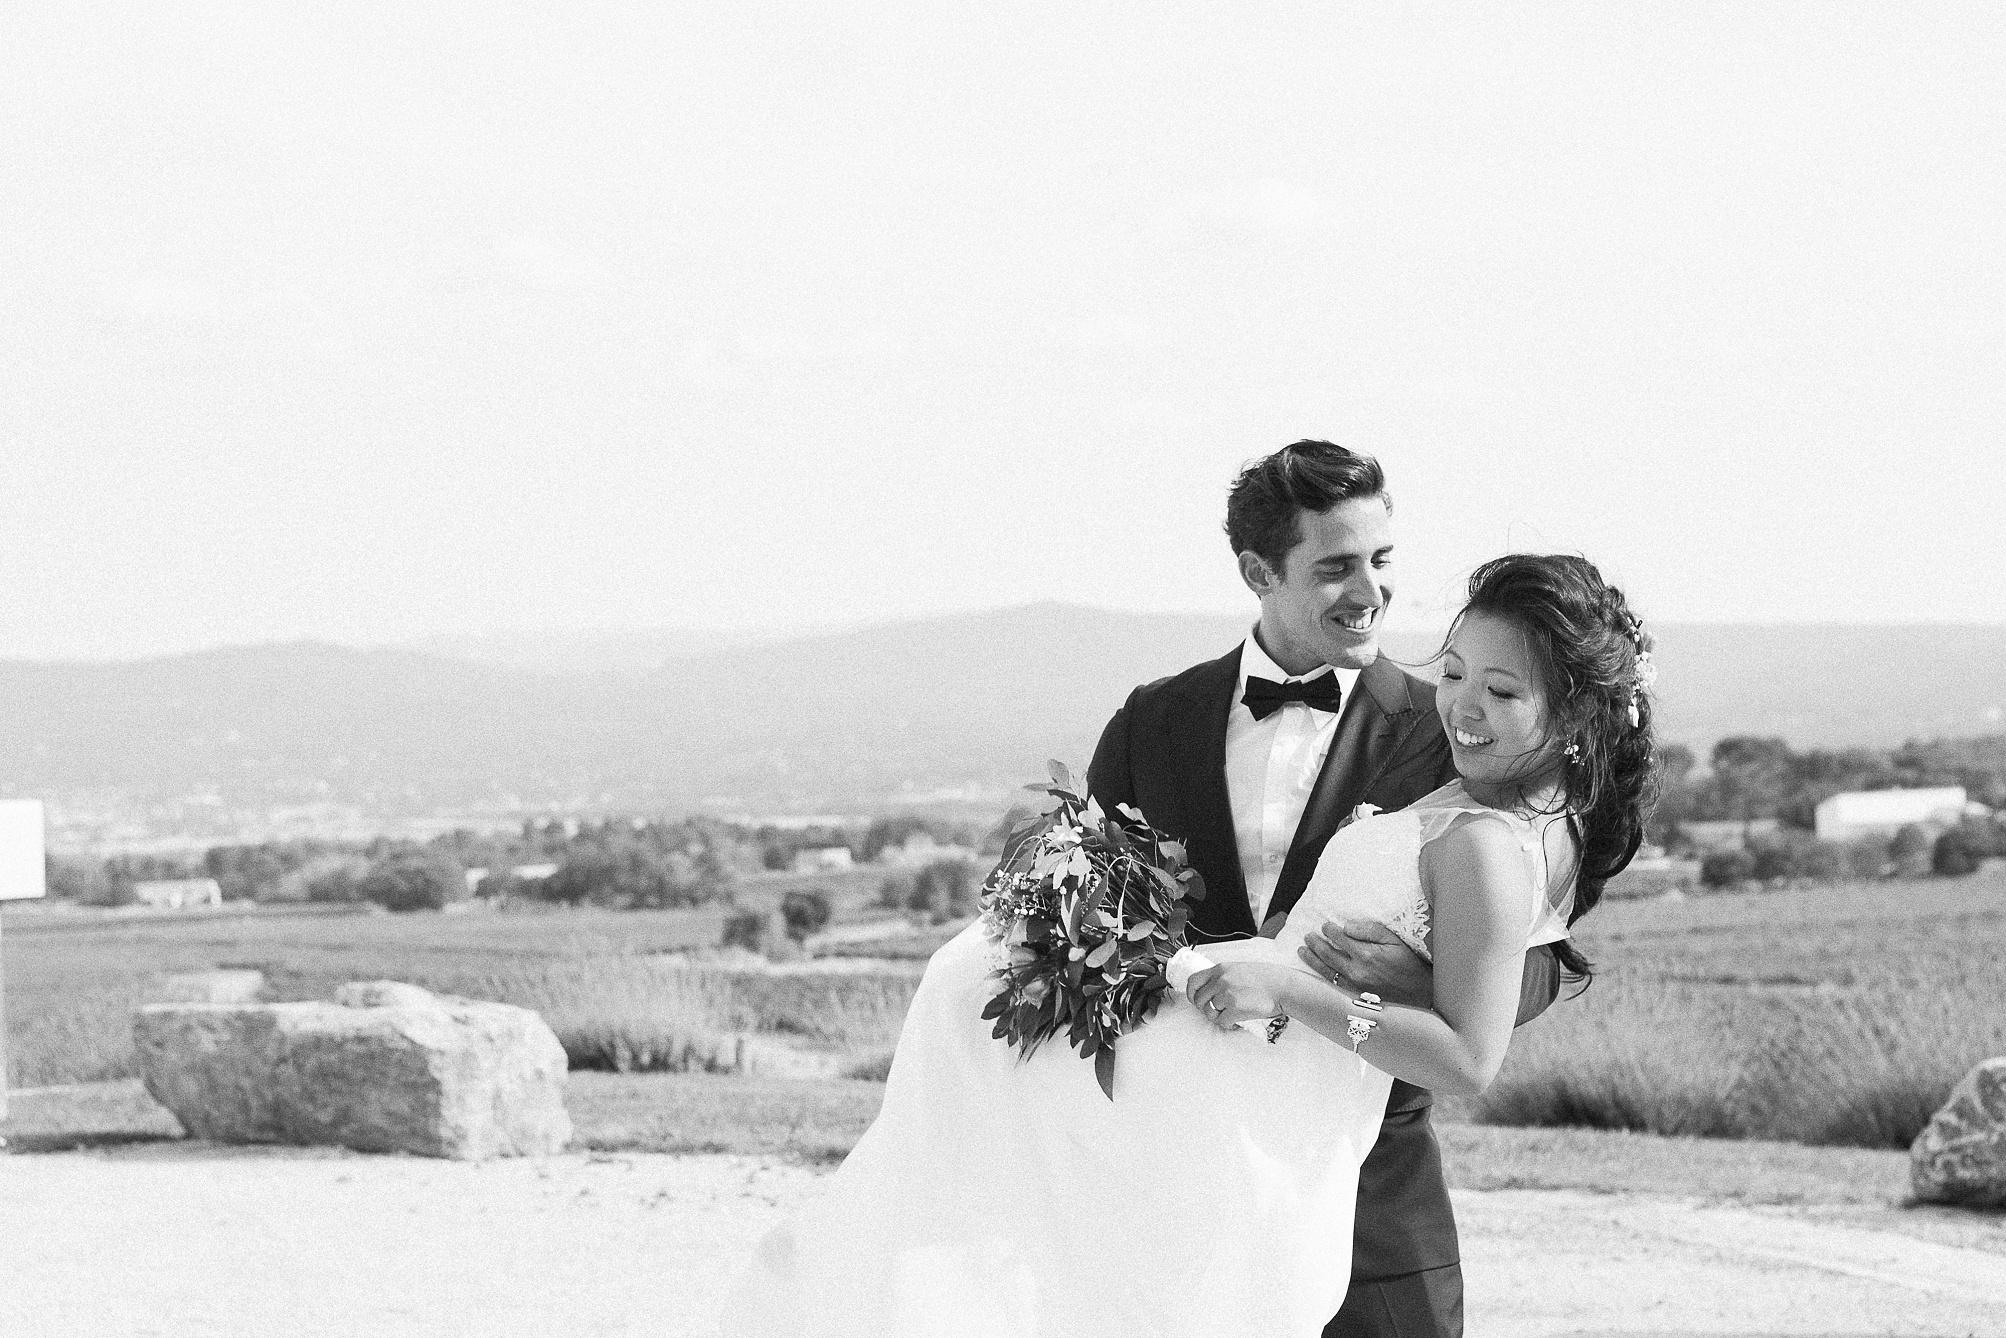 katerynaphotos-mariage-photographe-puyloubier-provence-aix-en-provence-sud-de-la-france_0398.jpg